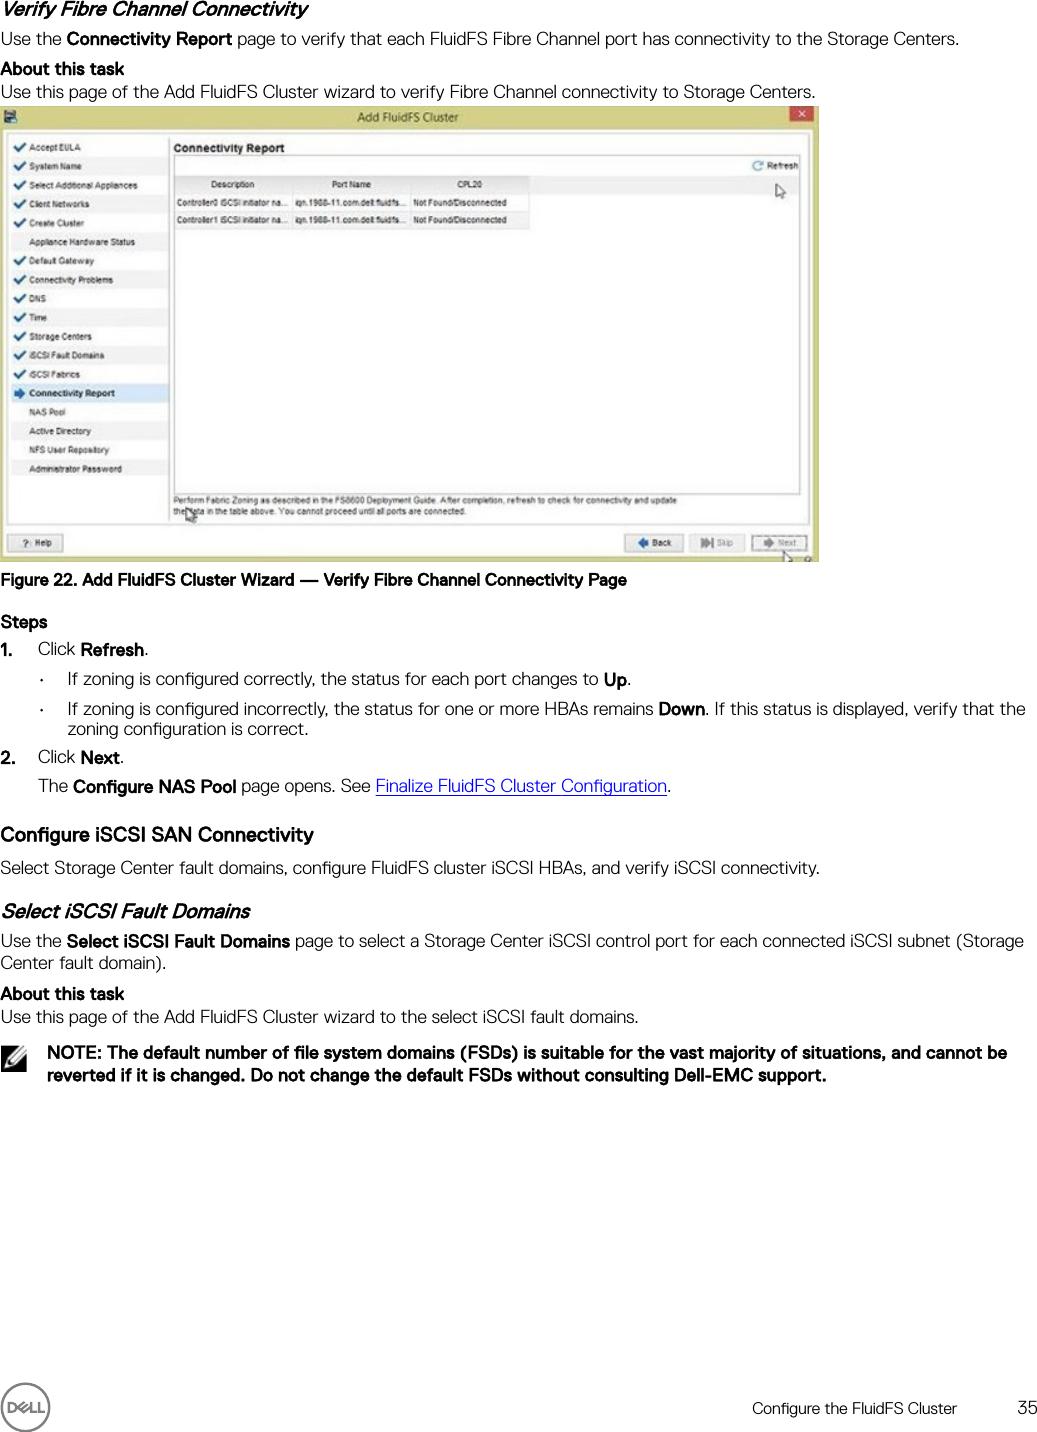 Dell compellent fs8600 FluidFS Version 6 0 Appliance